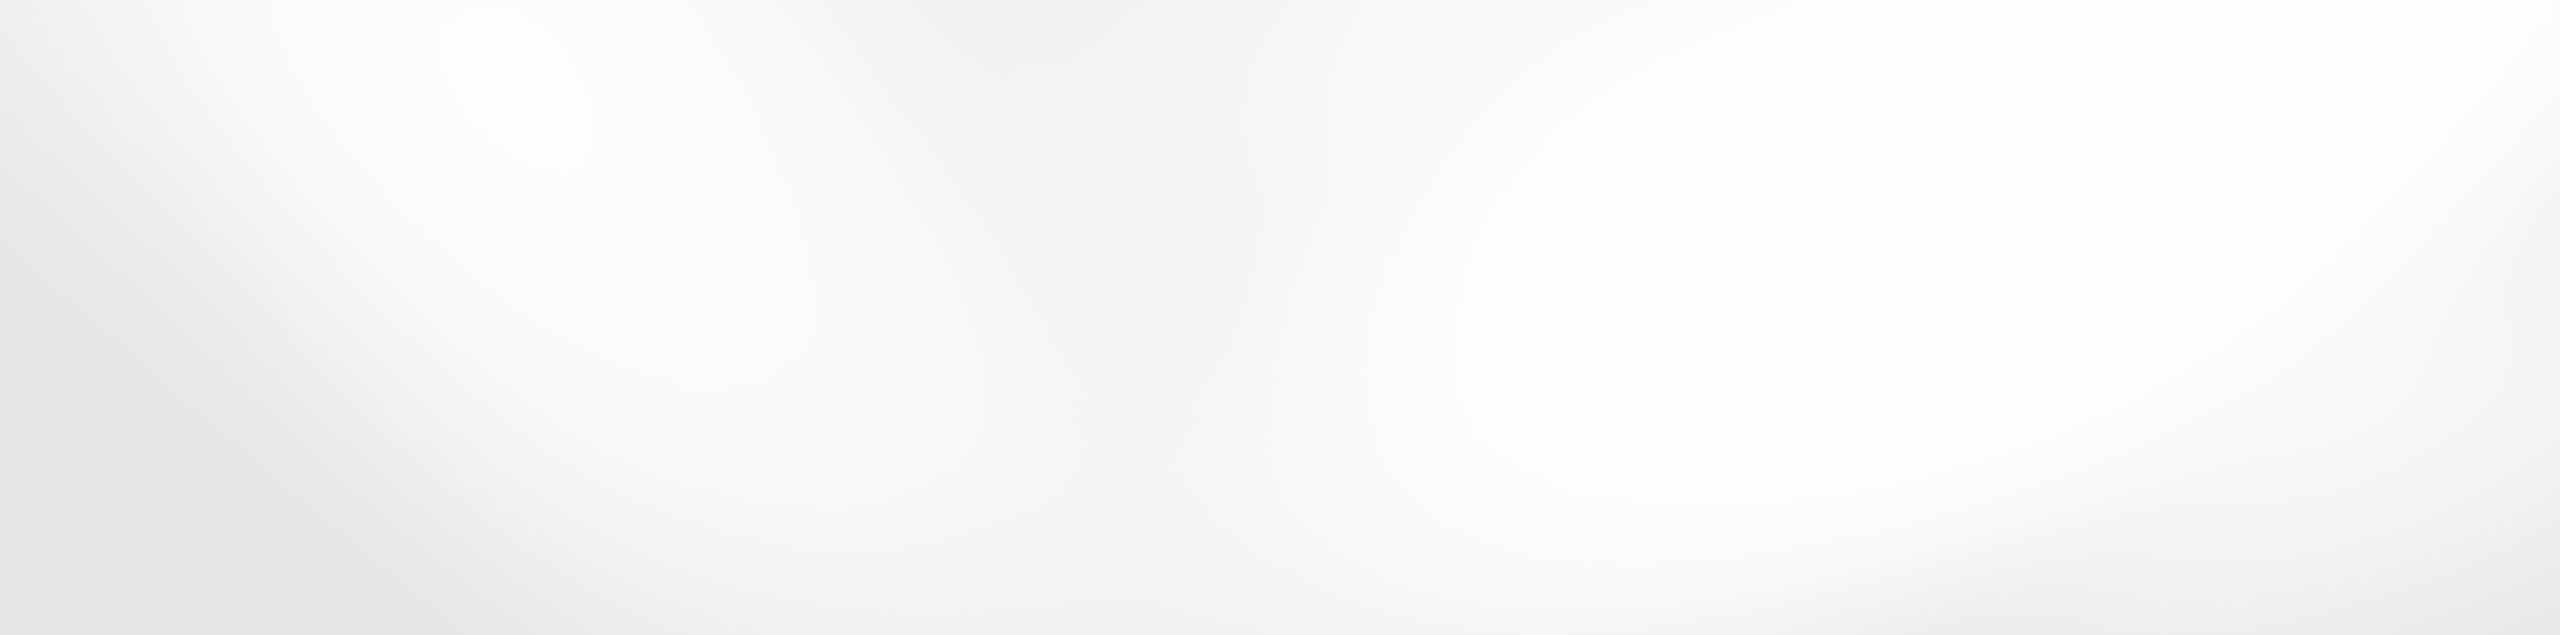 White fade background slider